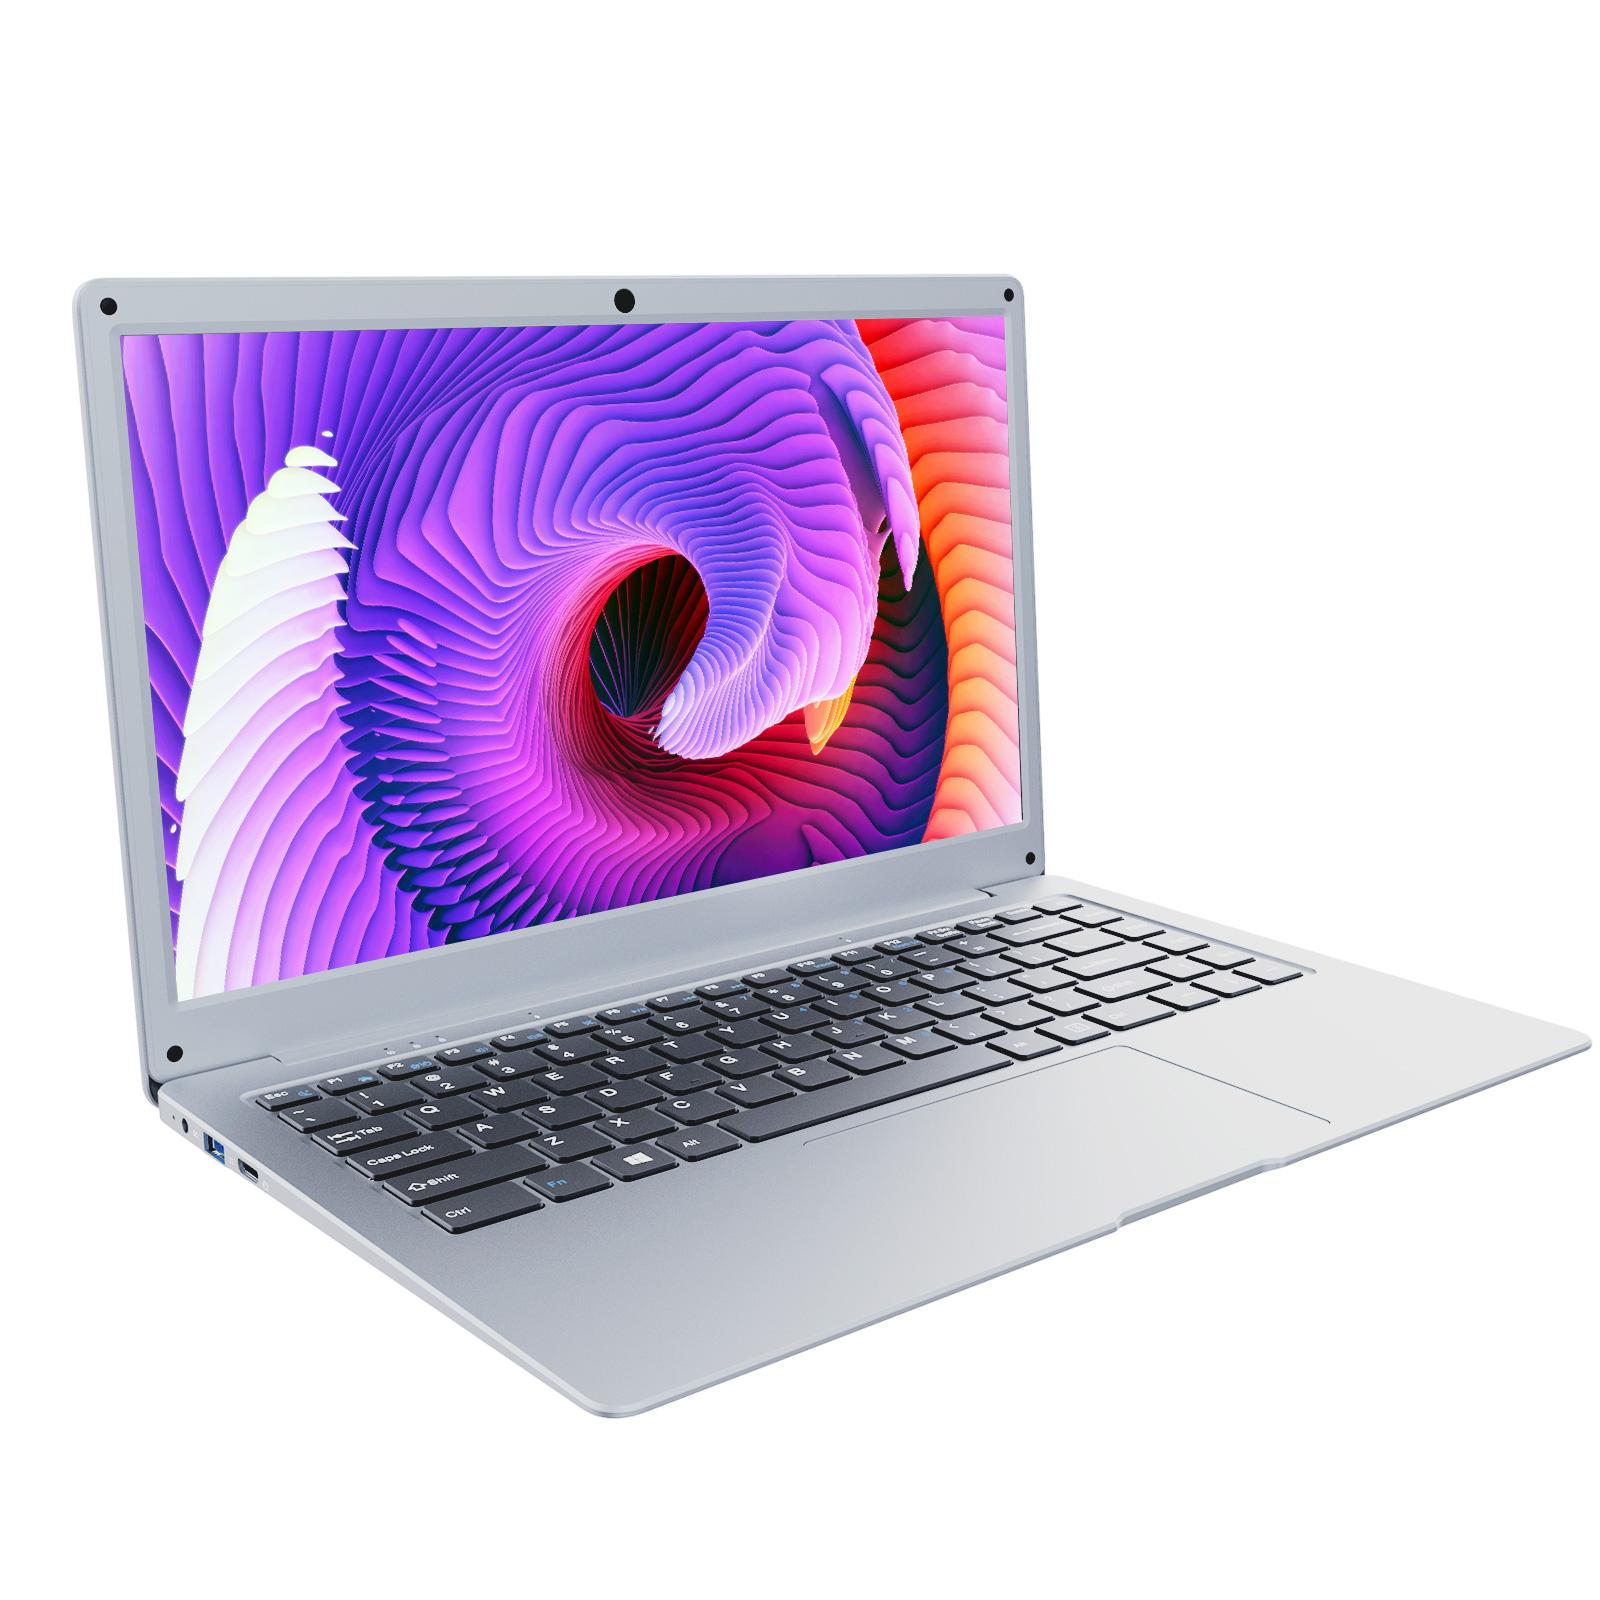 Original JUMPER Ezbook S5 Intel 14inch Laptop 8gb Ram 256gb Ssd 1920*1080 Fhd Ips Super Light 4600mah Windows 10 Notebook Laptop 8+256G